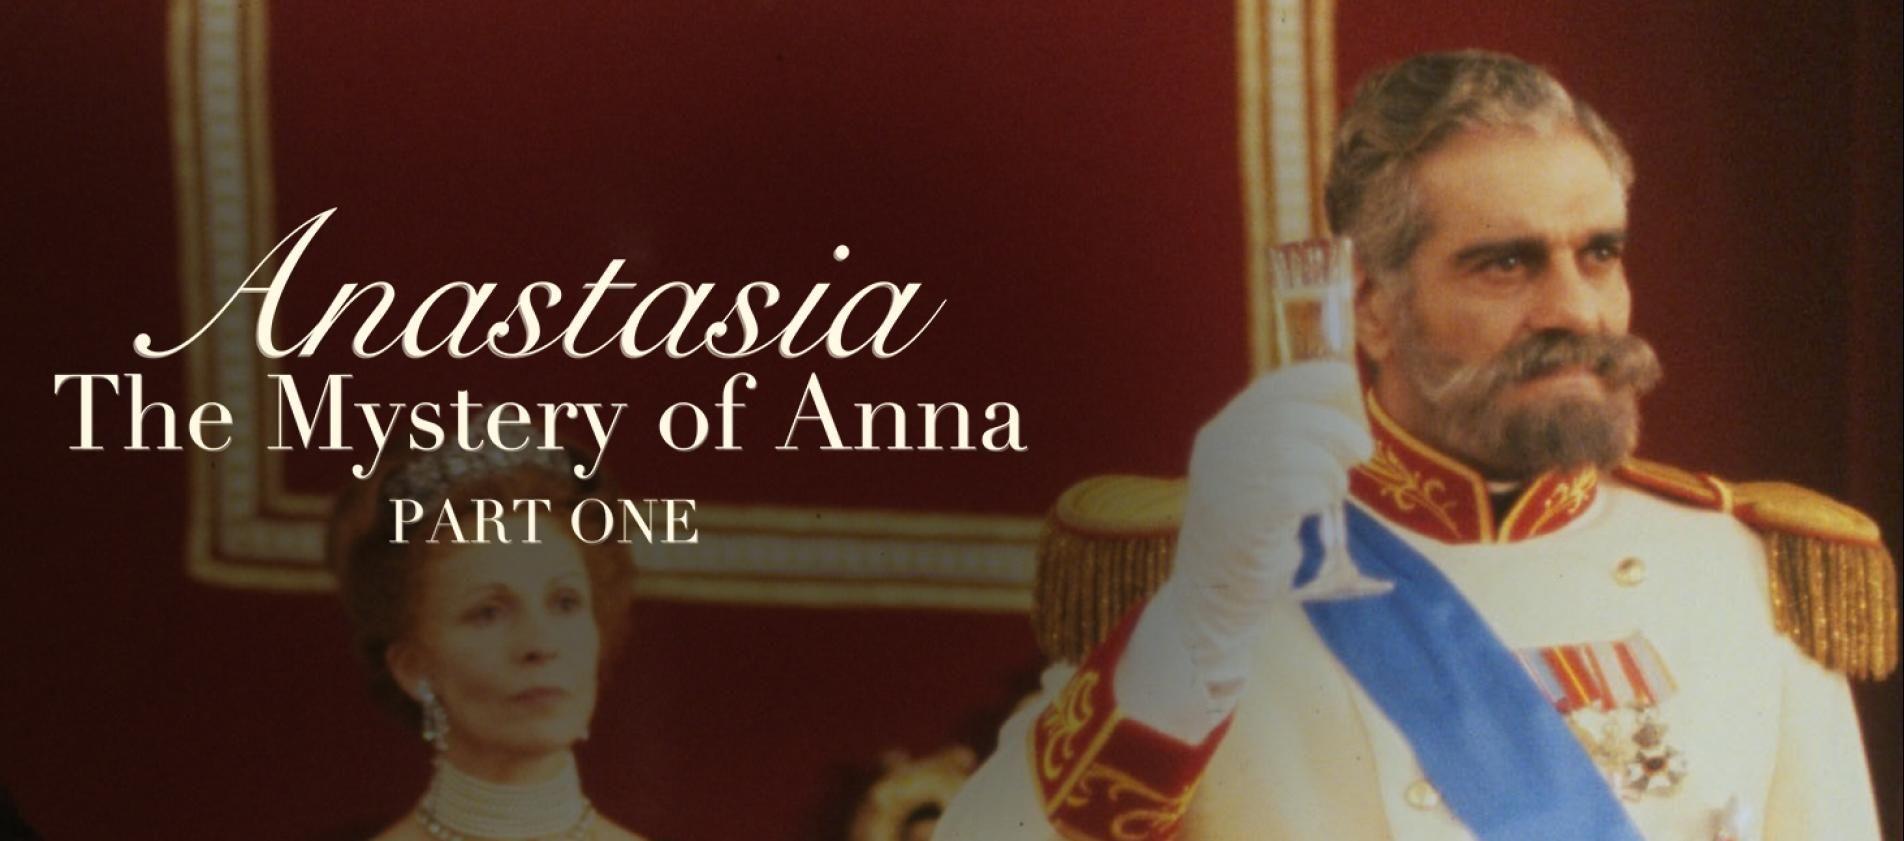 anastasia mystery